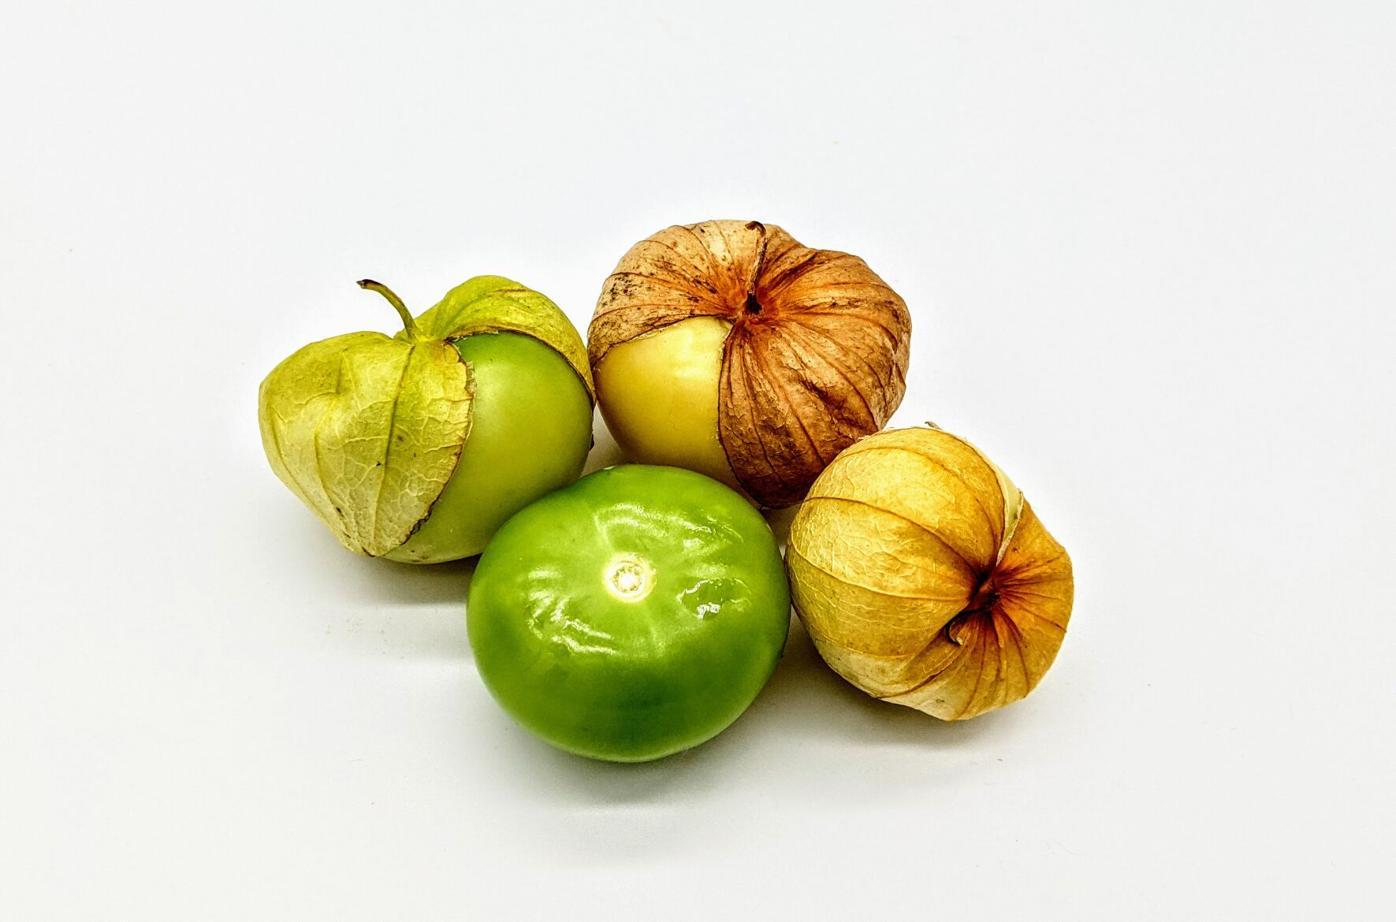 a green tomatillo and three tomatillos with husks